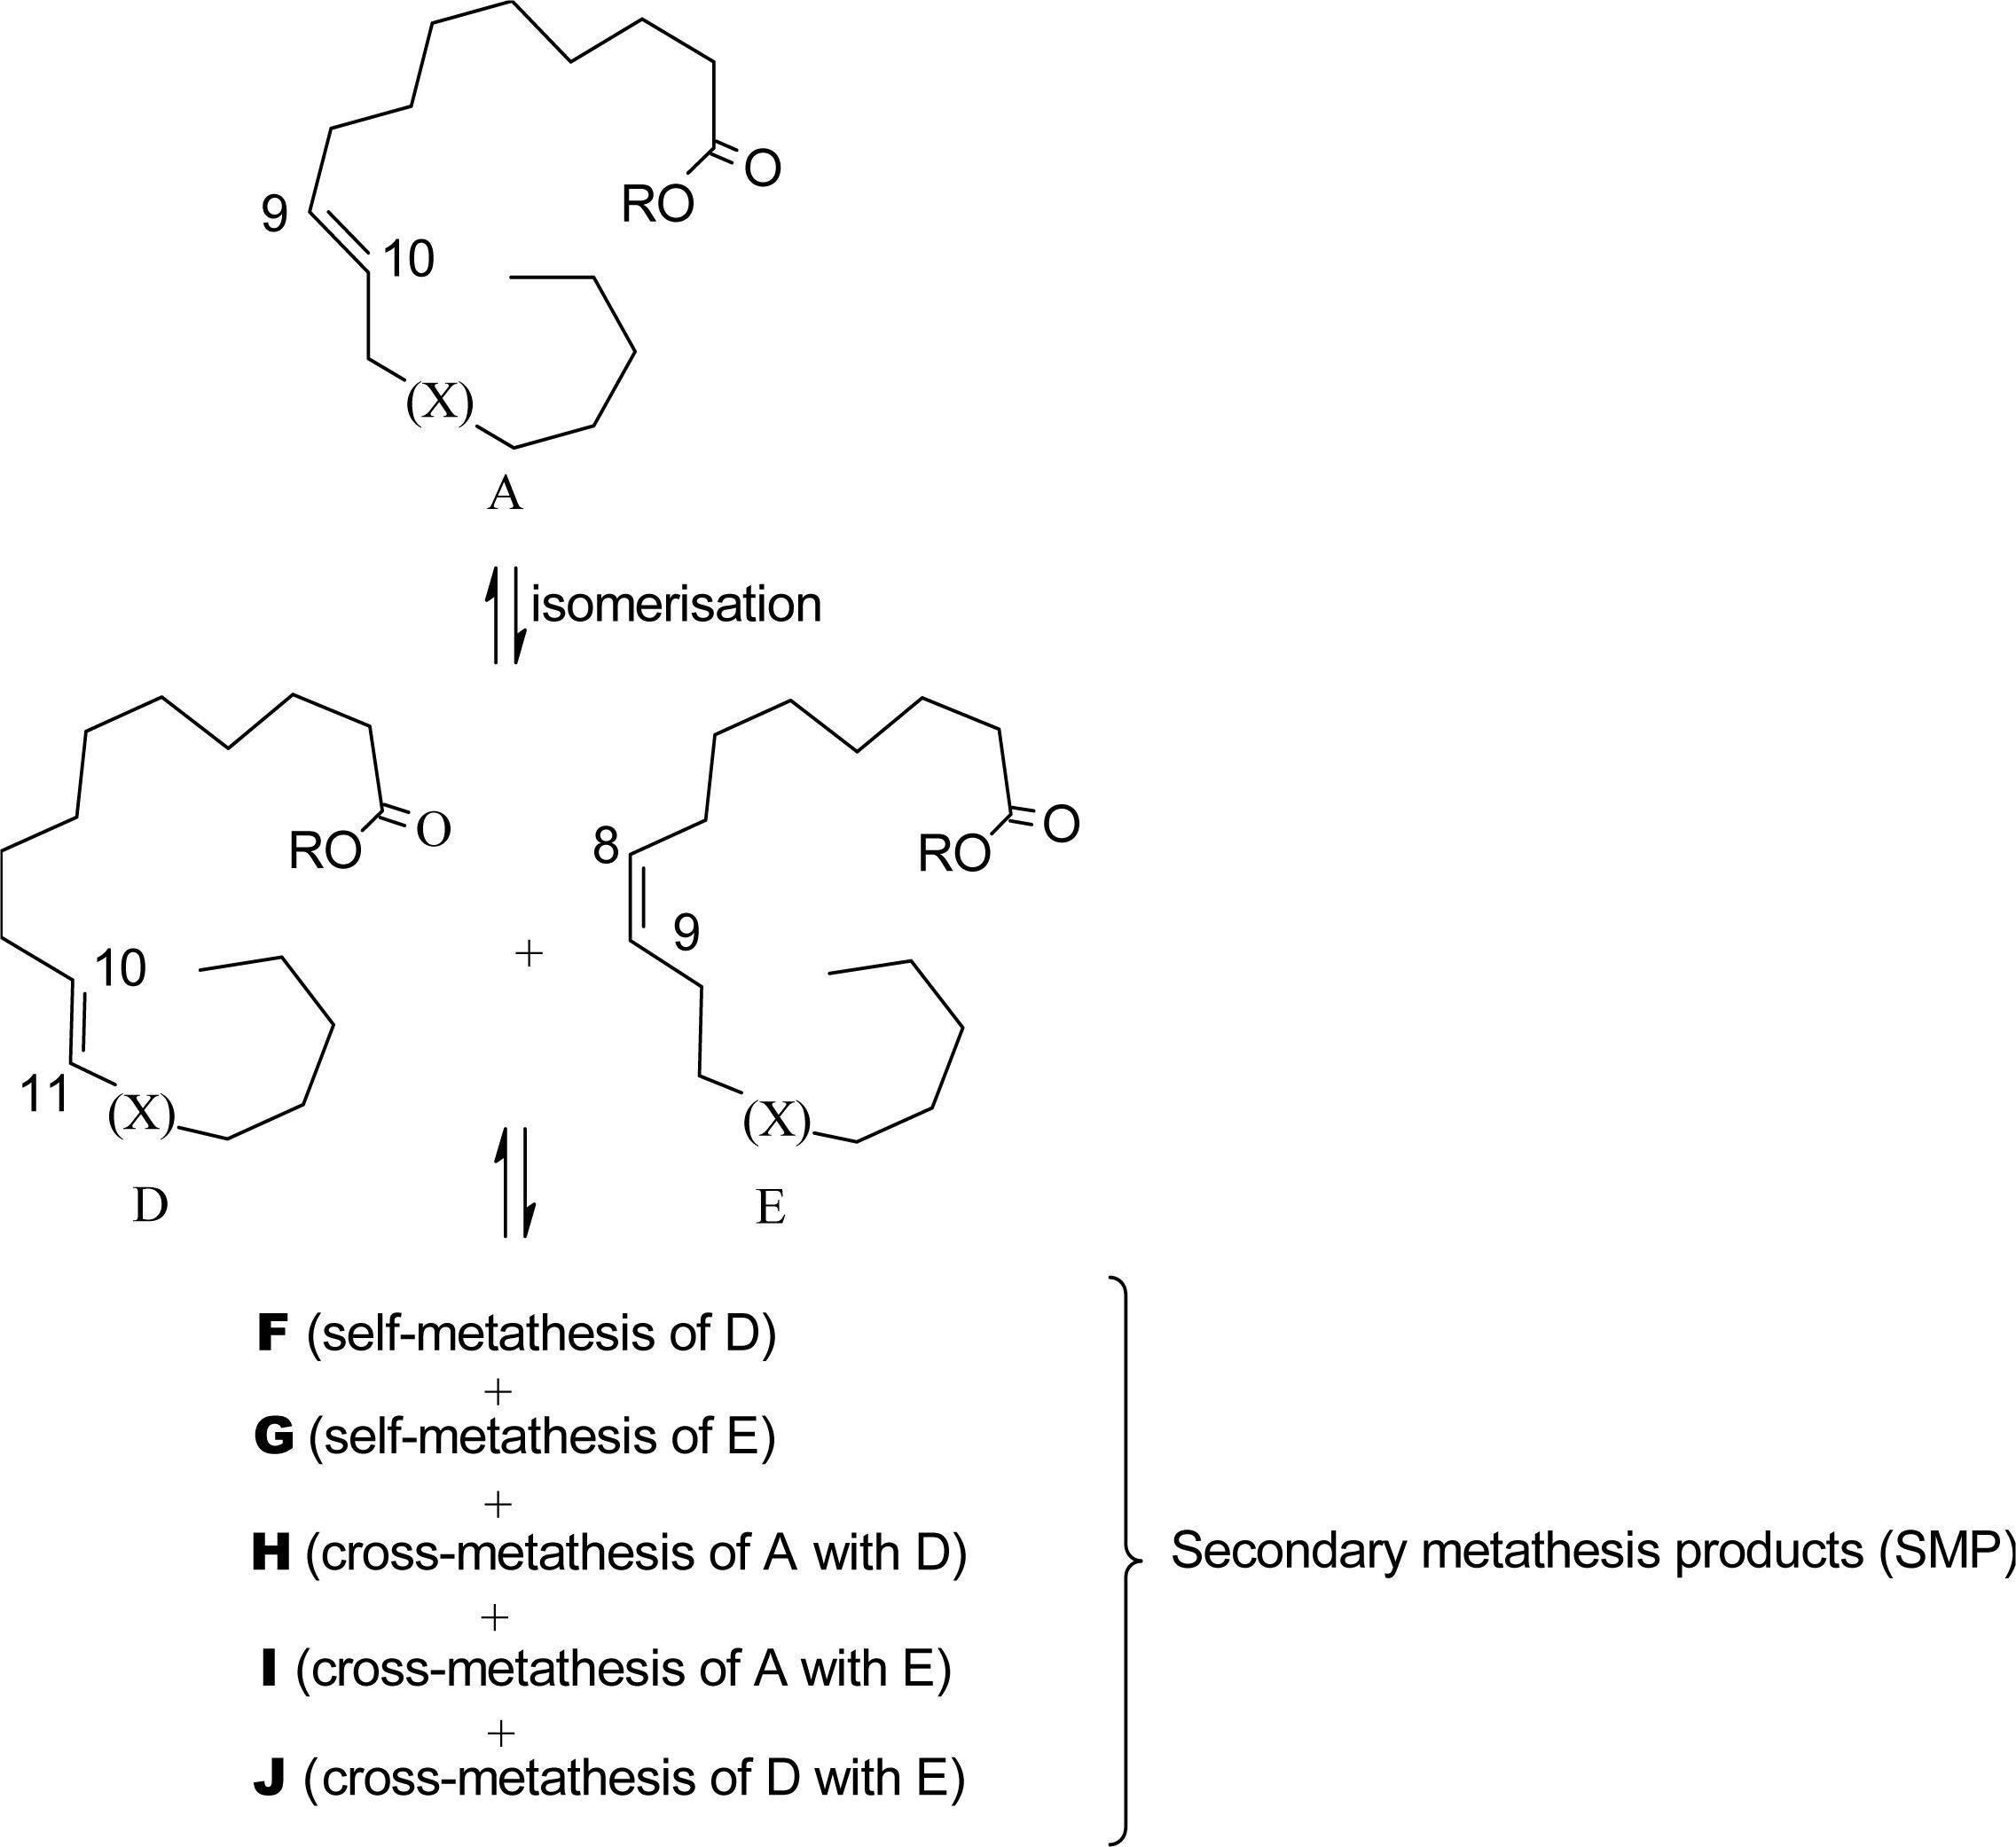 ruthenium cross metathesis Ruthenium carbamato-benzylidene chelates are latent olefin metathesis catalysts • complexes exhibit high catalytic activity after activation with acids.